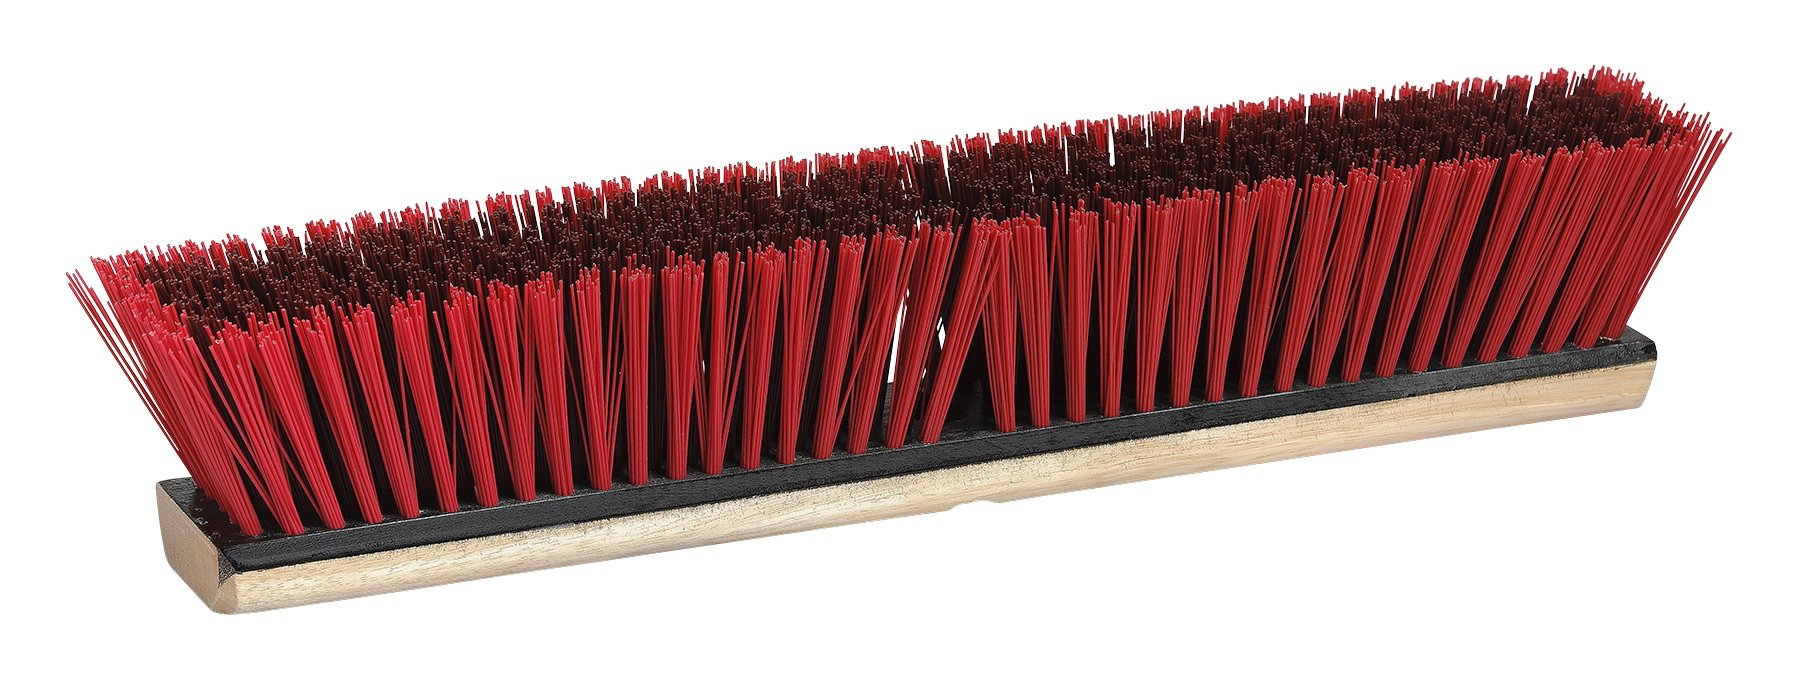 M2 Professional 24 Inch Garage/Warehouse Heavy Duty Push Broom Head with Hardwood Block - Medium/Coarse Sweep (Case of 12)